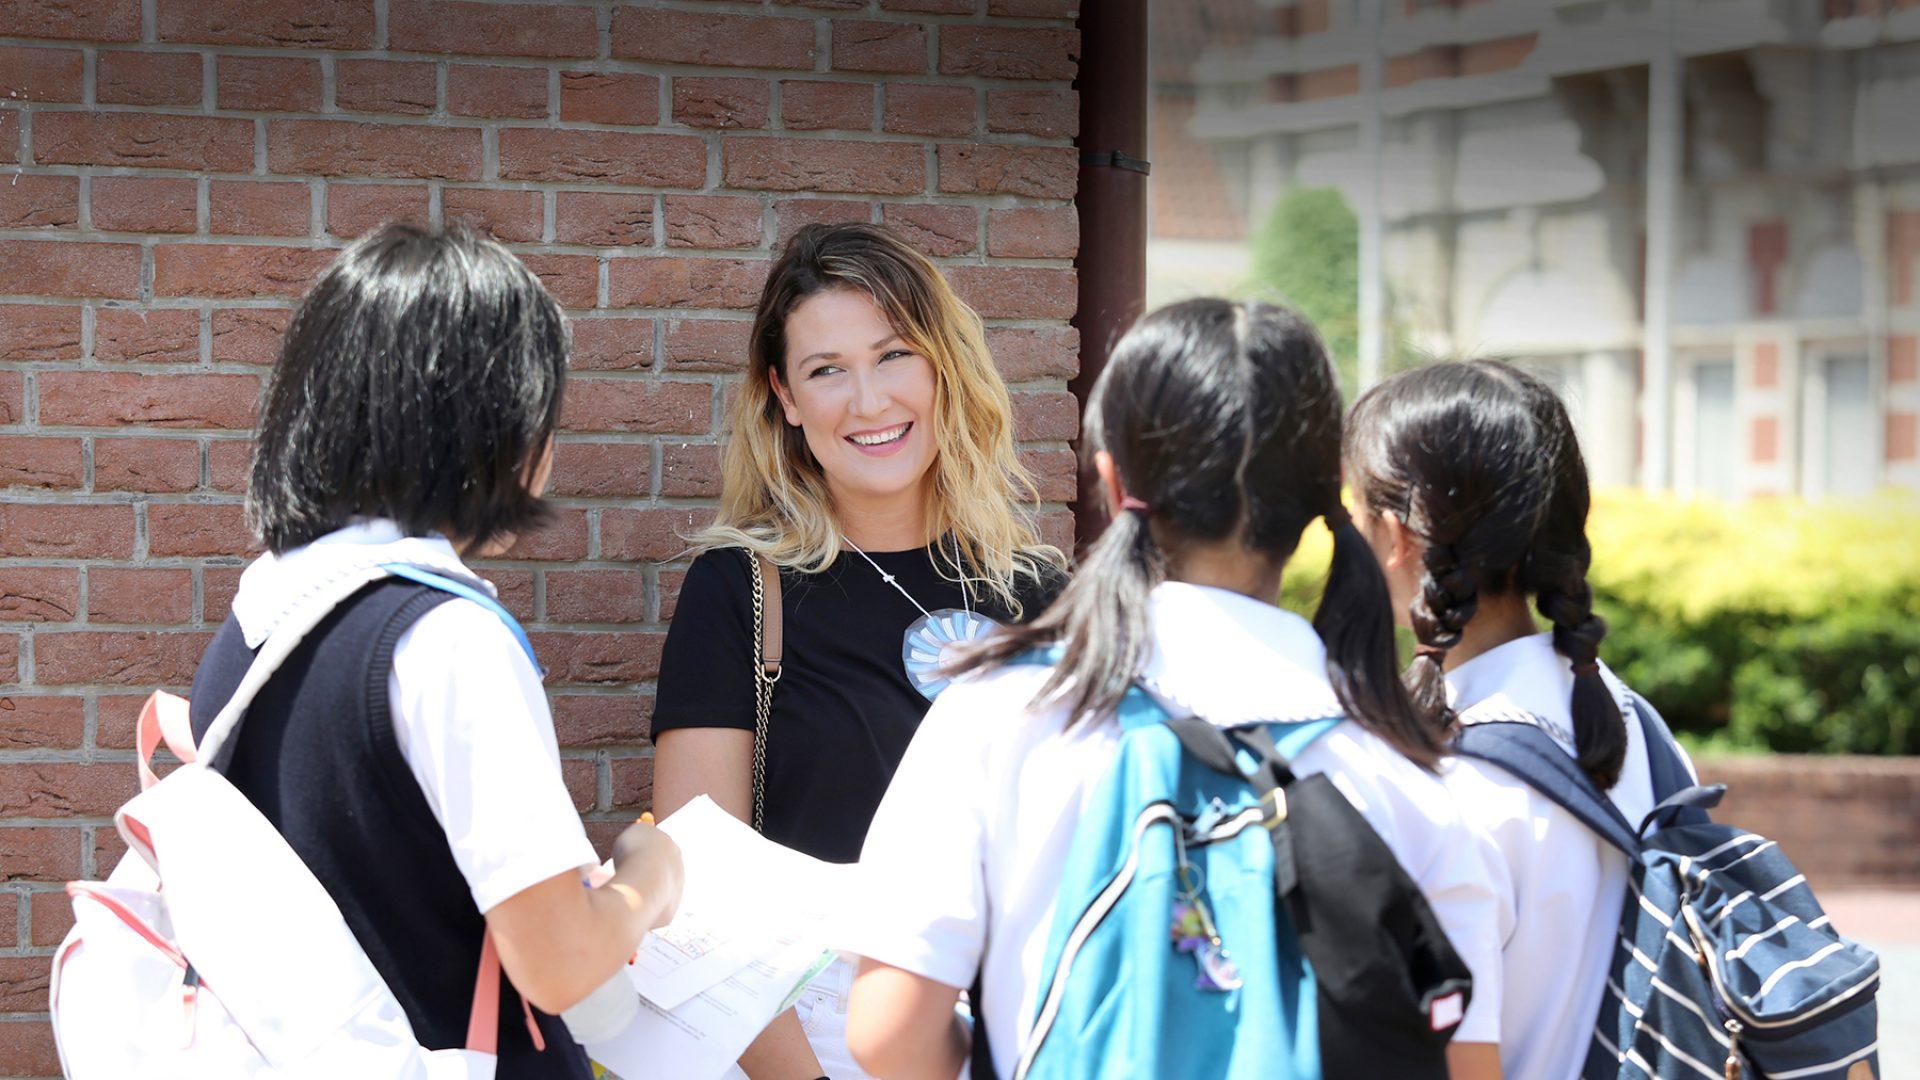 FUN FIRST 英語プログラム|株式会社ジャイロスコープ